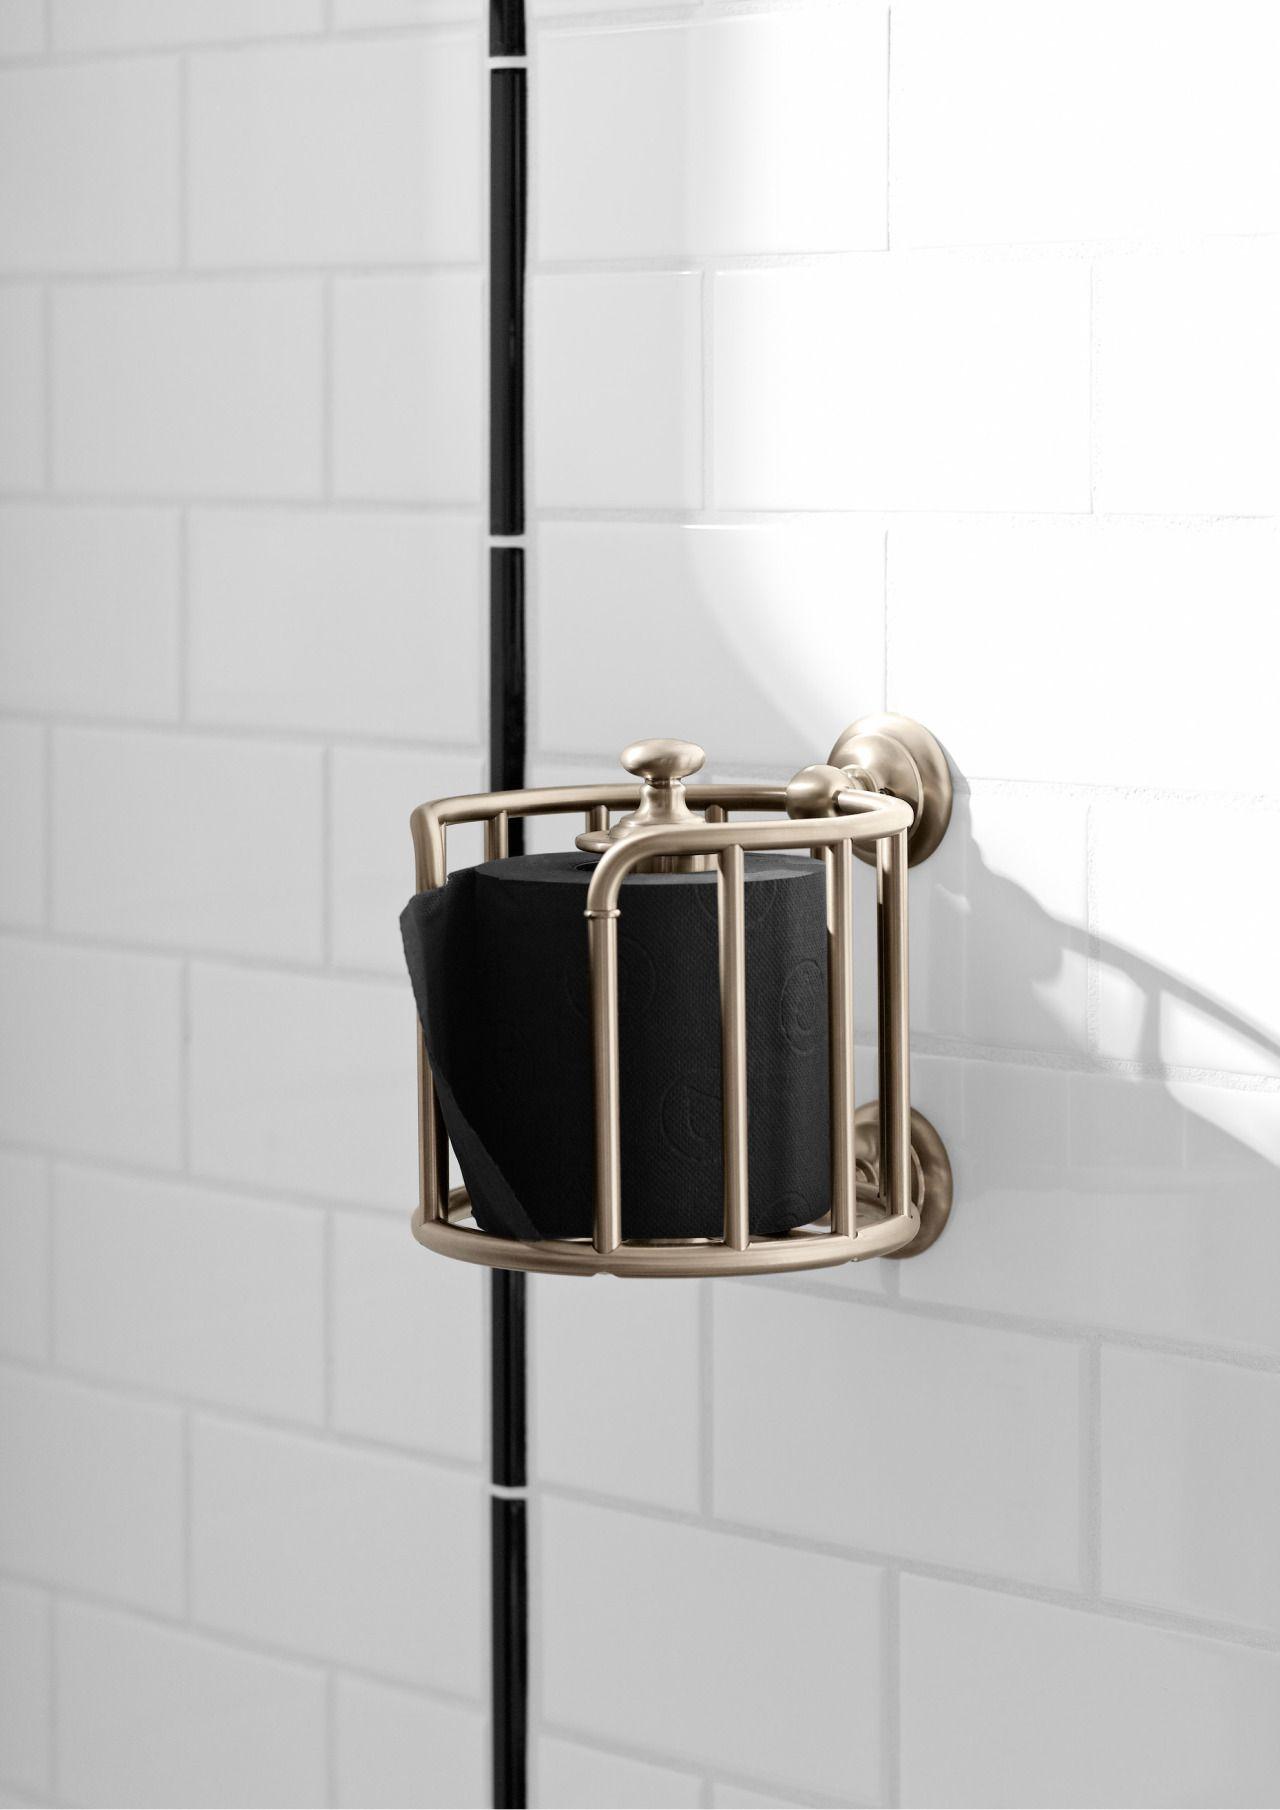 Contemporary Us.kohler Onlinecatalog Embellishment - Bathtub for ...